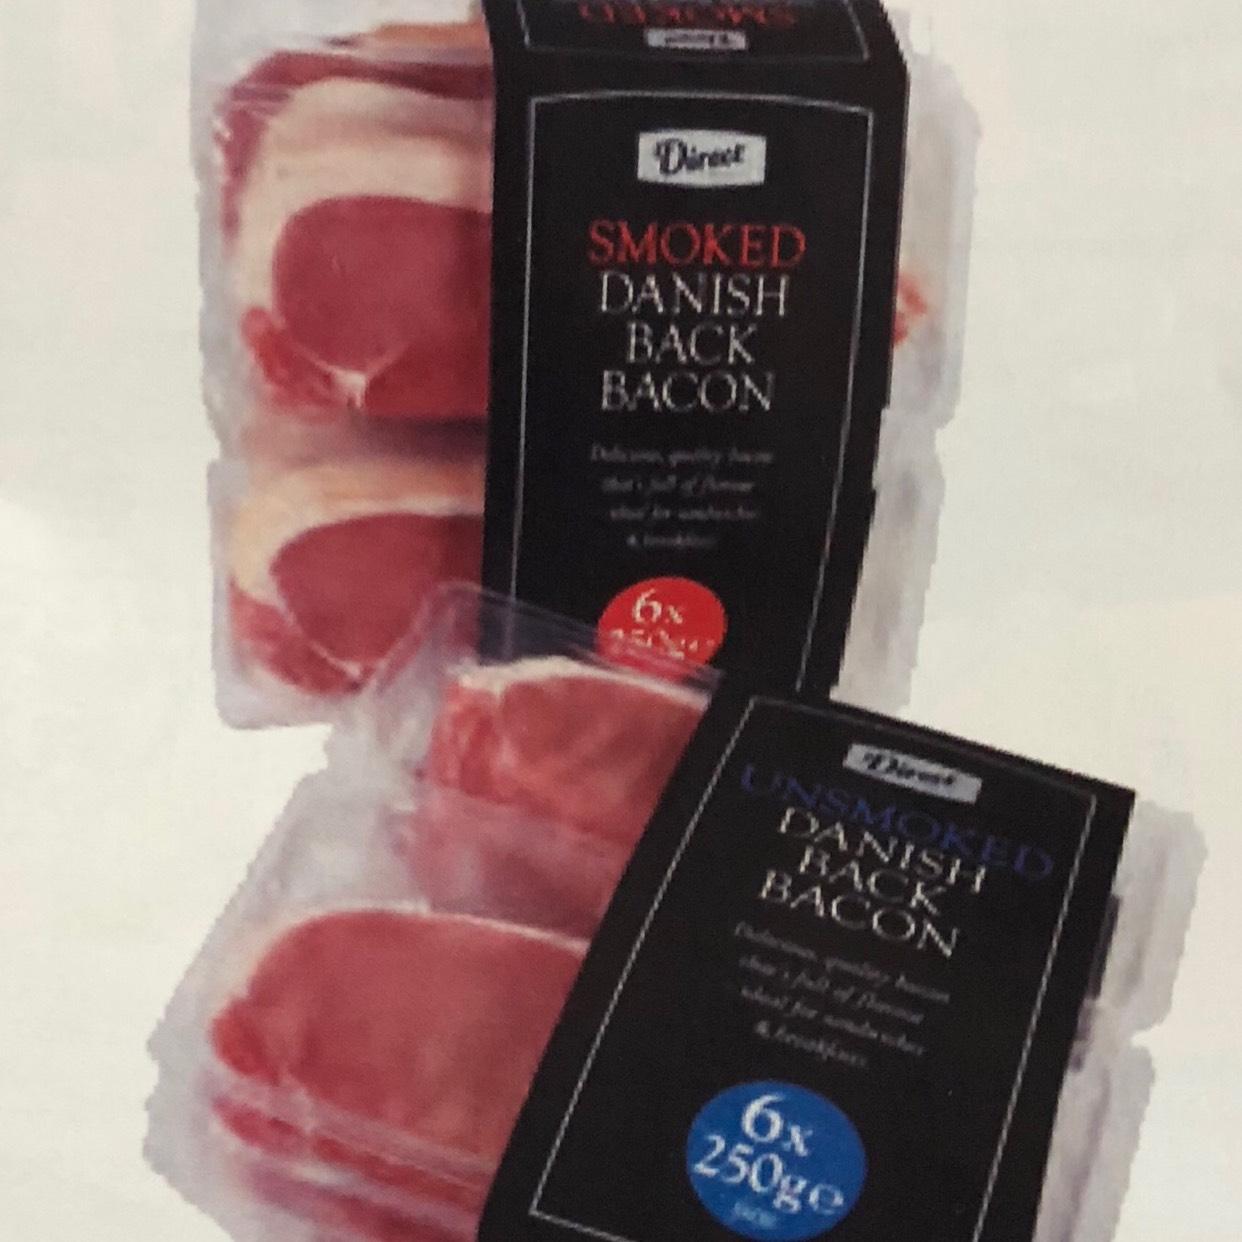 3KG Back Bacon (12x250g) @ Costco £8.98